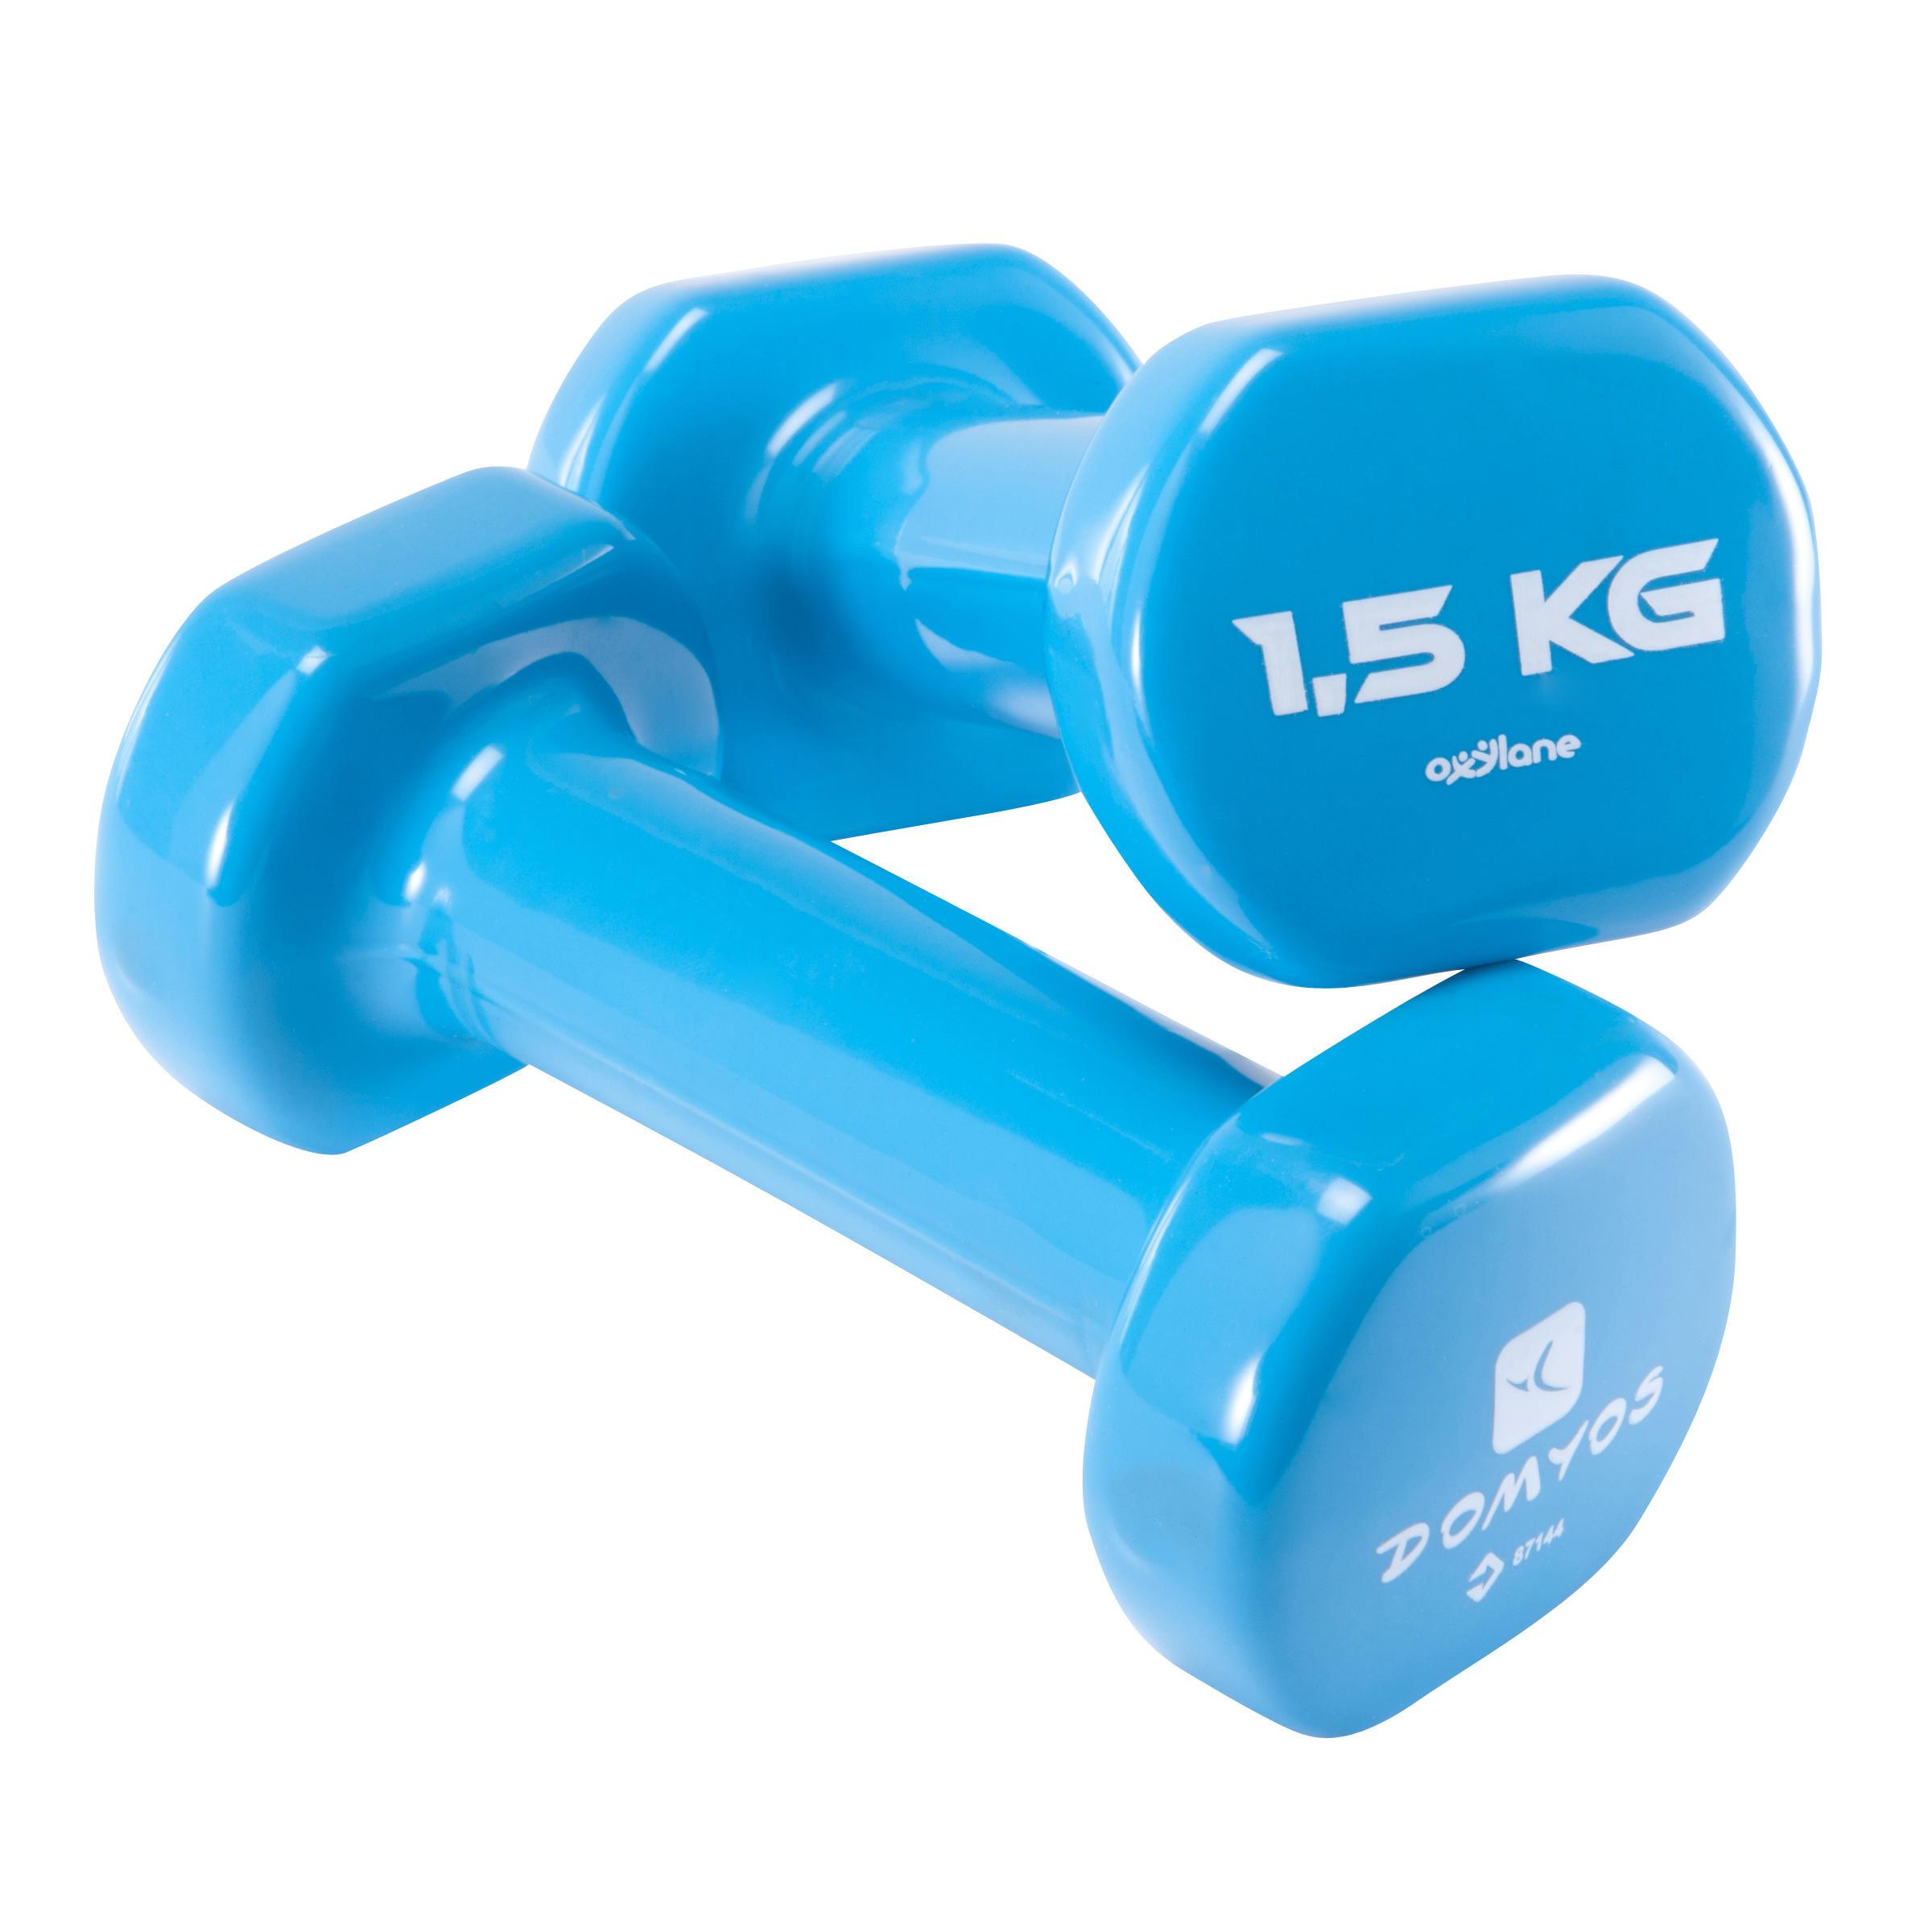 Gantere 1.5 kg x2